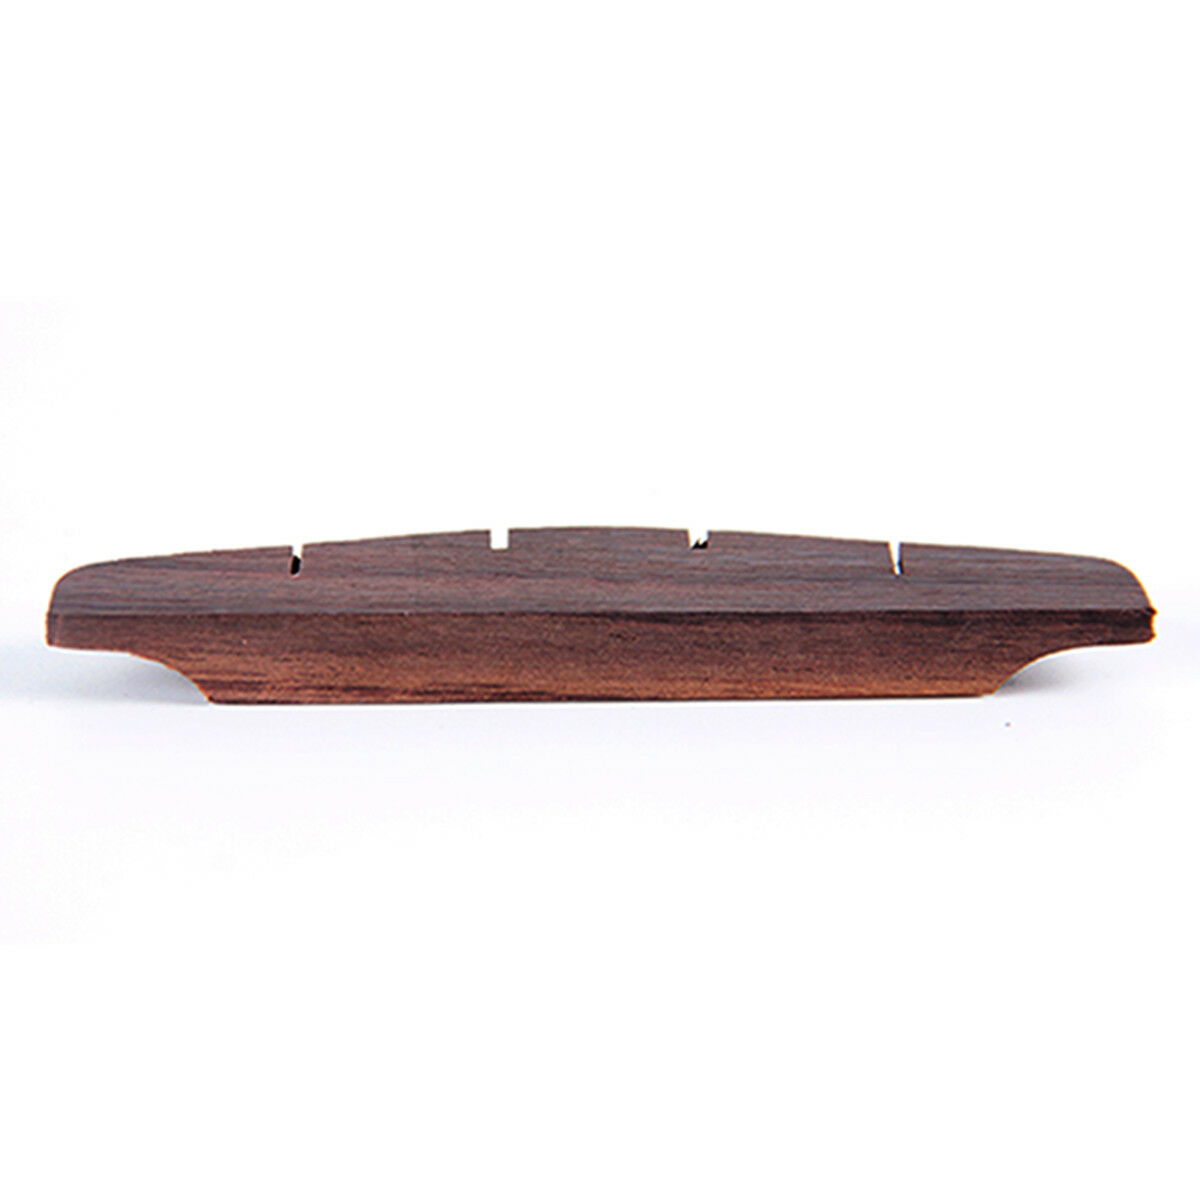 ukulele bridge for uke ukelele hawaii guitar parts replacement slotted 634458768962 ebay. Black Bedroom Furniture Sets. Home Design Ideas